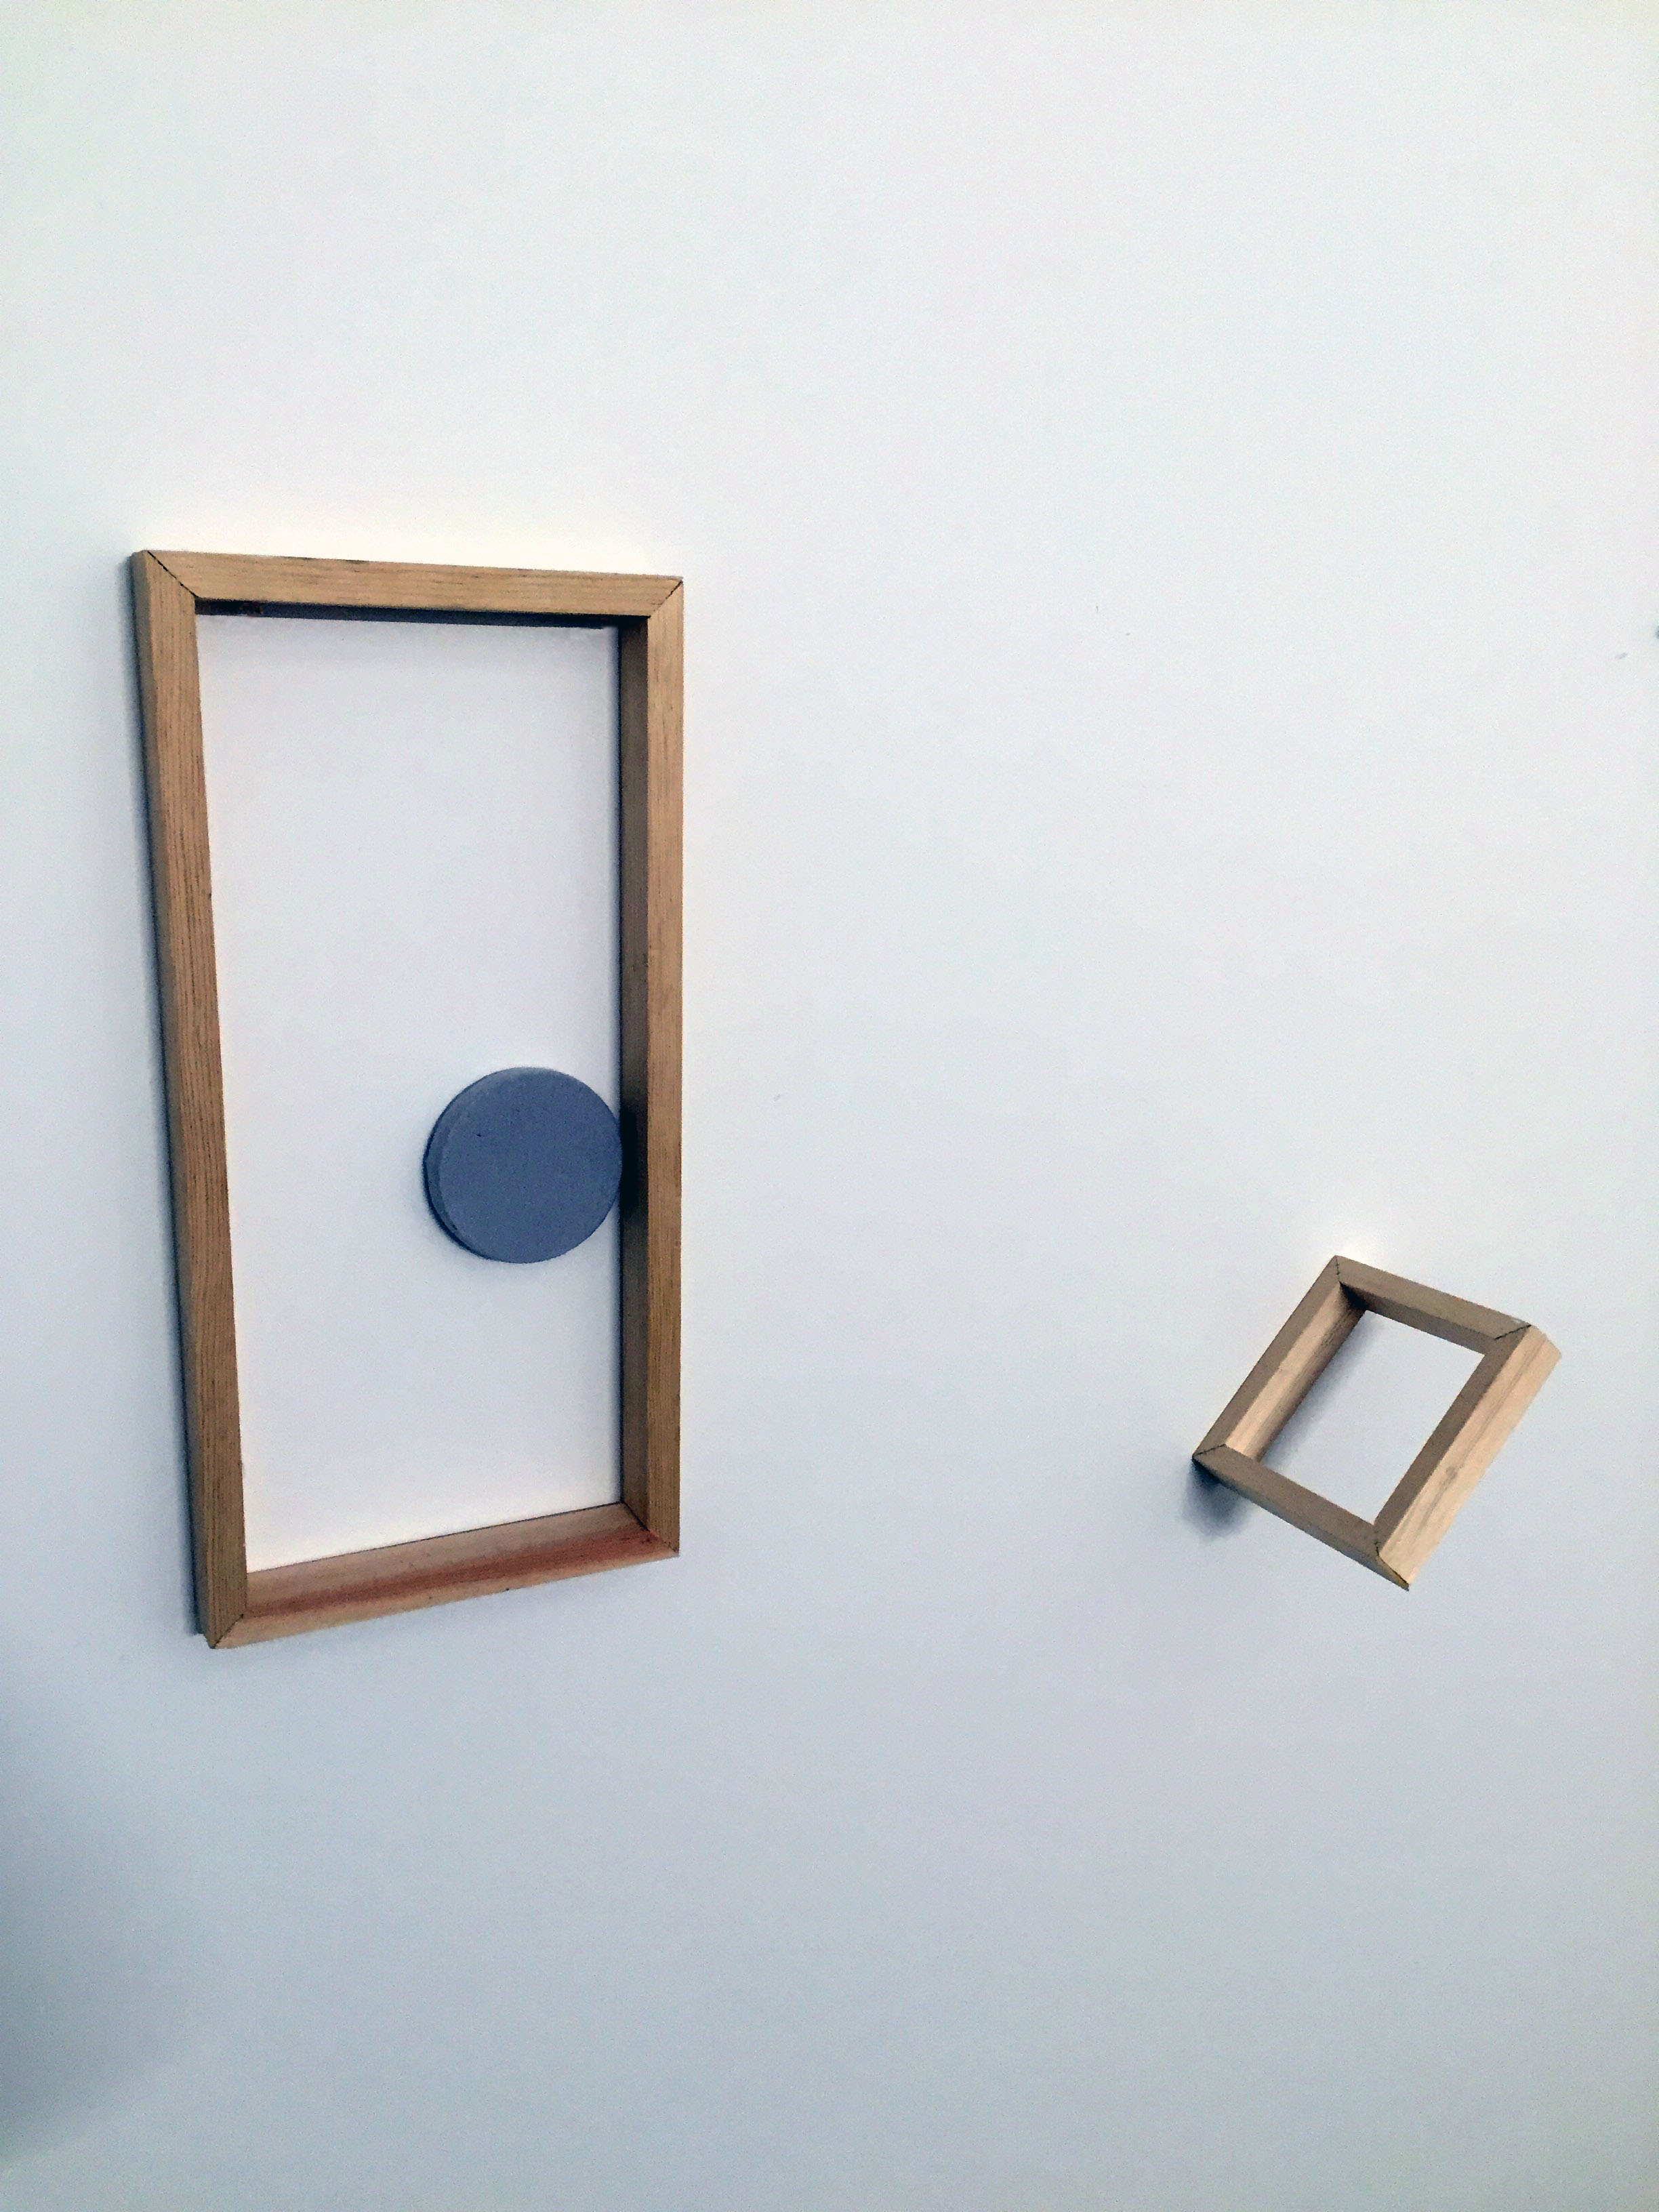 Wood, Paint, Distance, Space, 2015